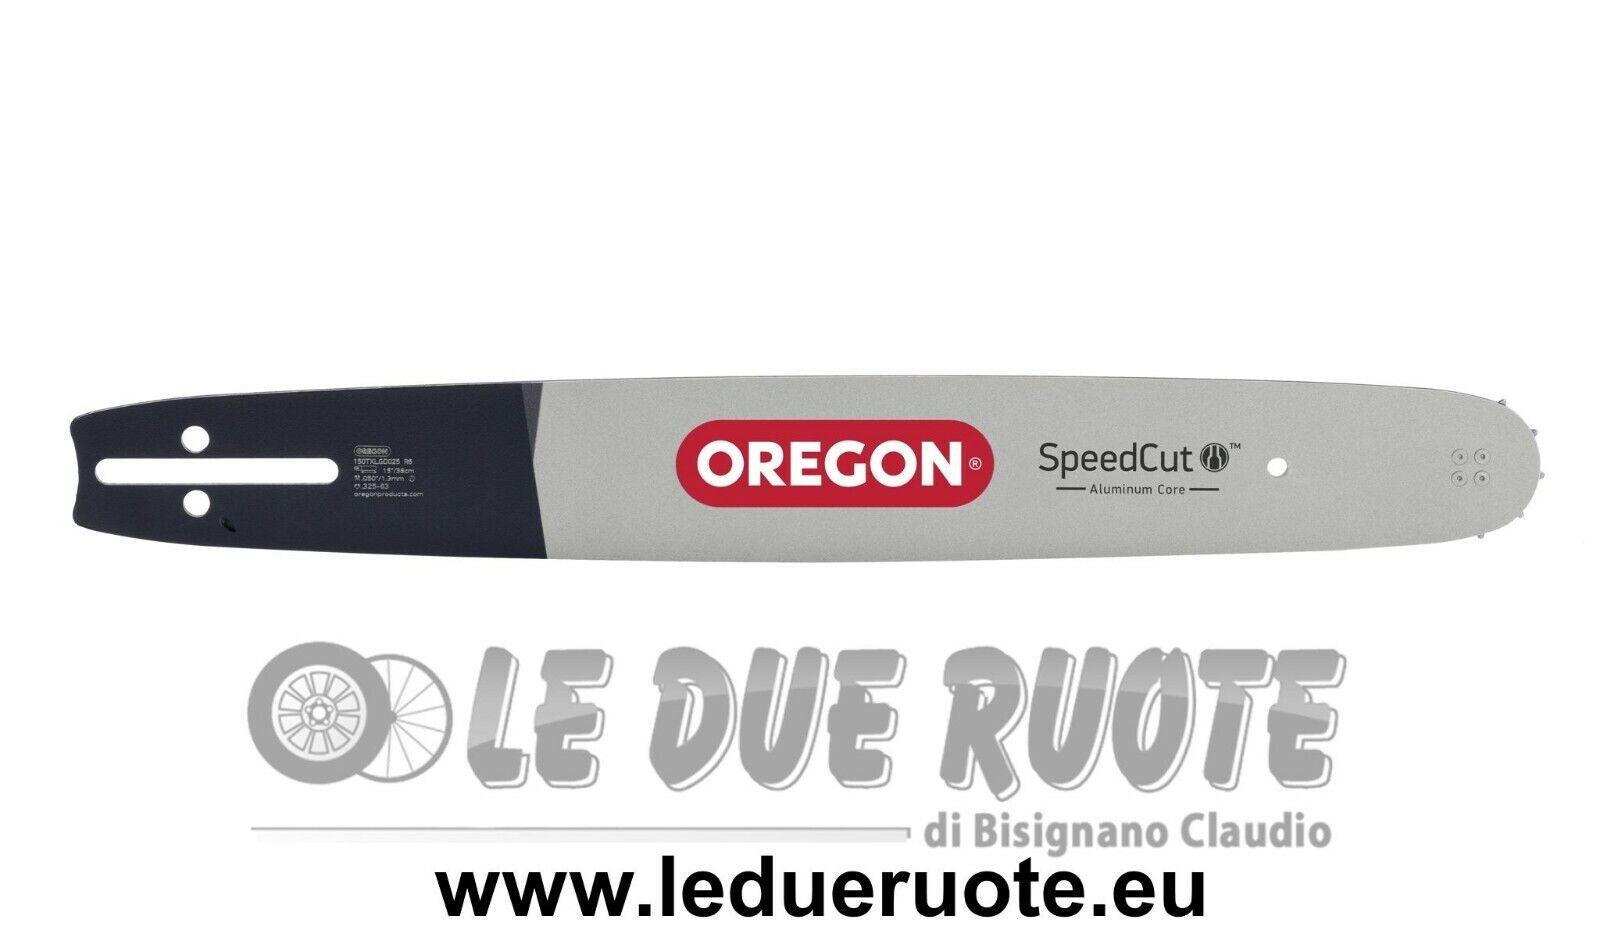 Barra Oregon Motosierra Stihl MS290 MS280 Speed Cut™ 33 38 40 45 50 cm Original